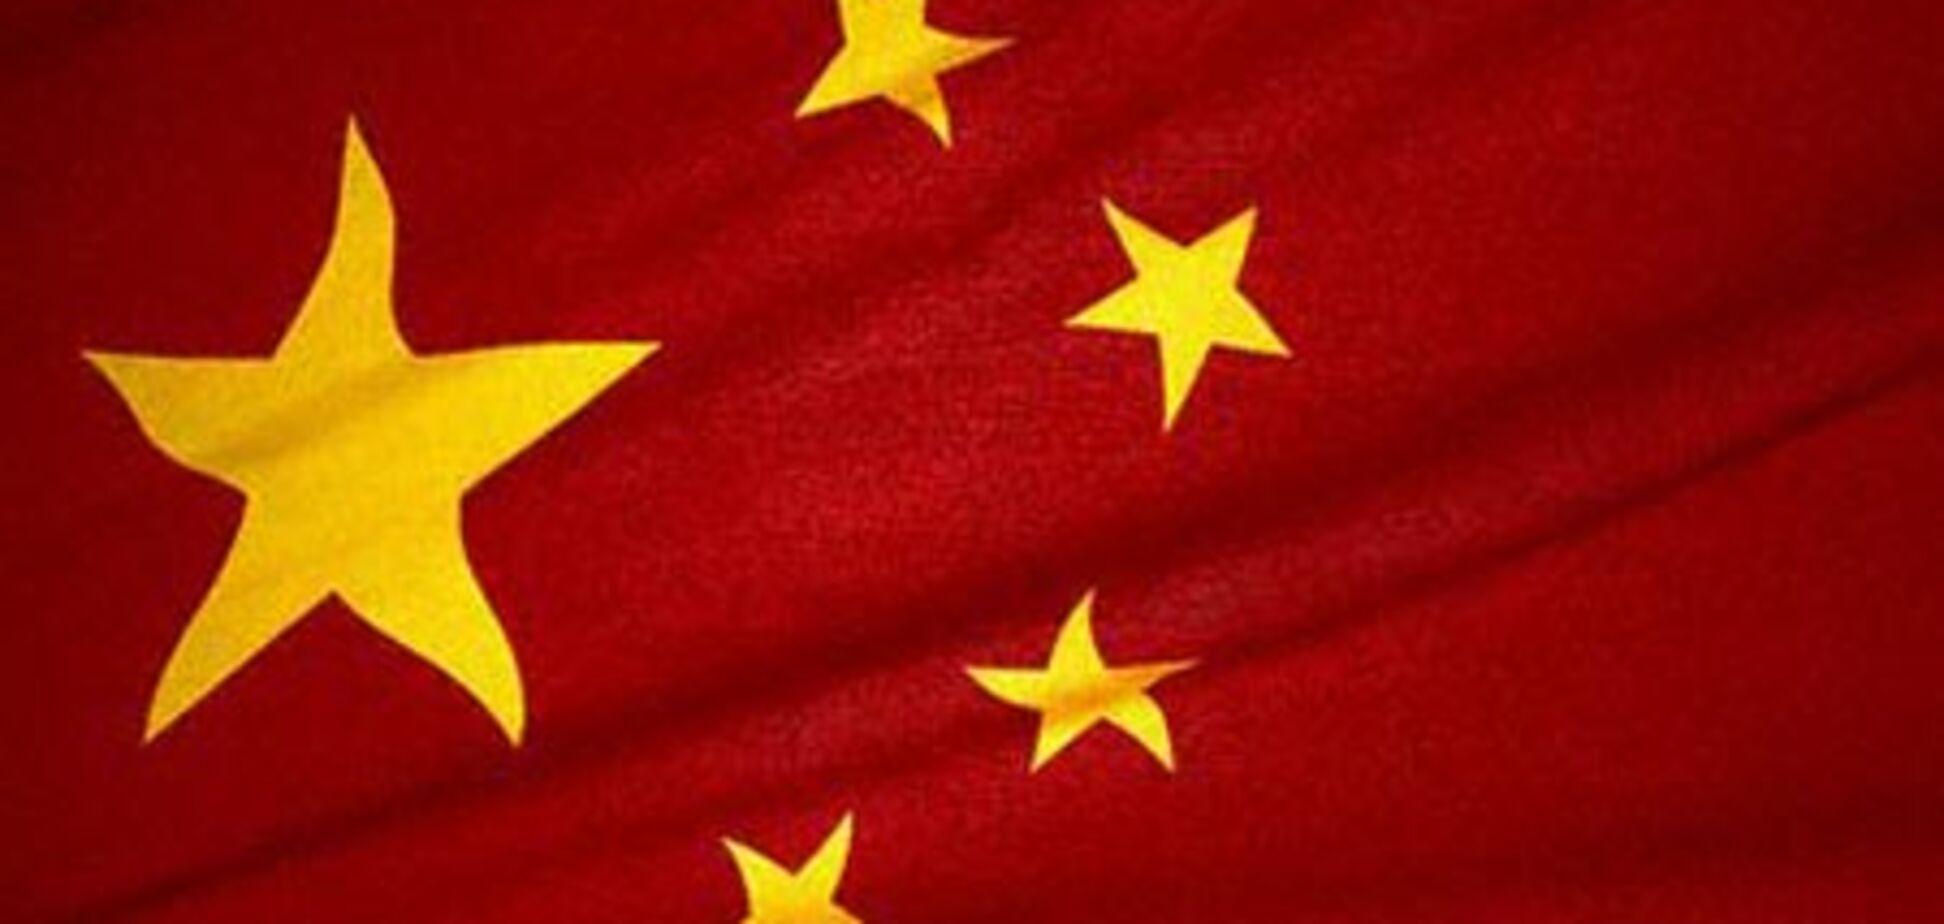 Стратегія Китаю дозволить заполонити всю планету